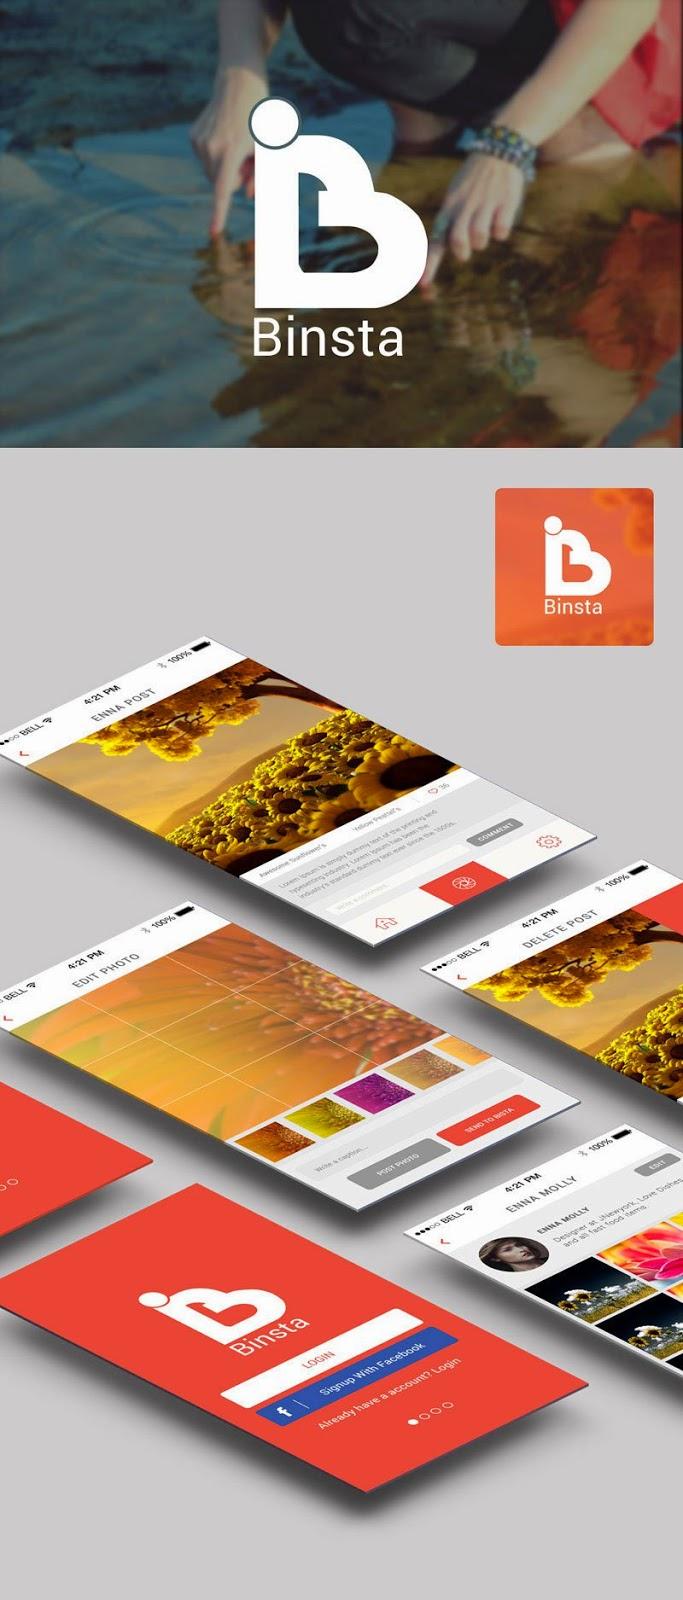 Binsta App UI